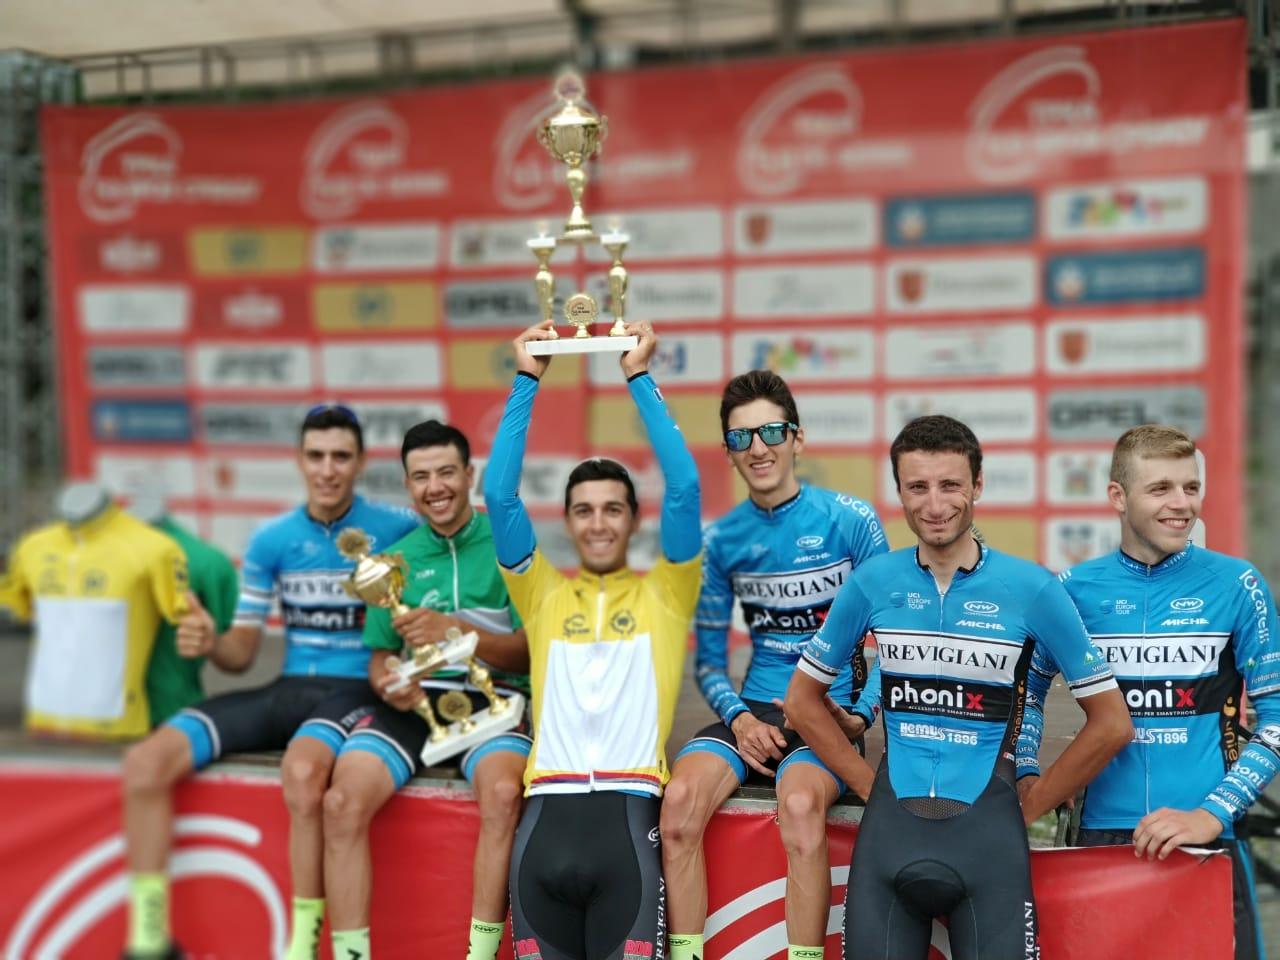 German Nicolas Tivani festeggia la vittoria del Tour of Serbia